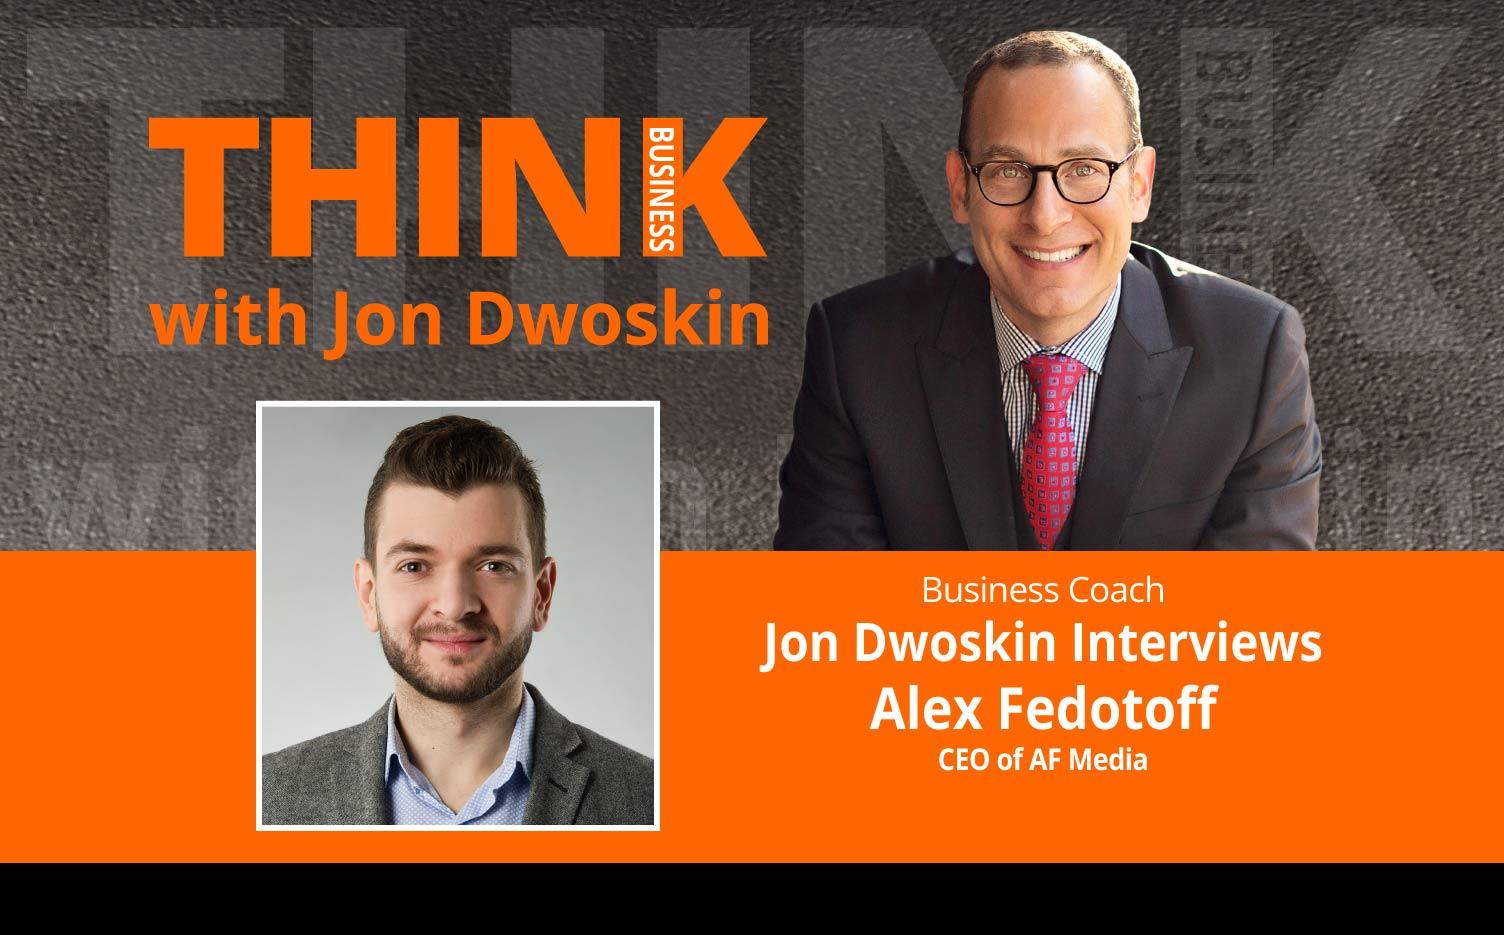 THINK Business Podcast: Jon Dwoskin Interviews Alex Fedotoff, CEO of AF Media